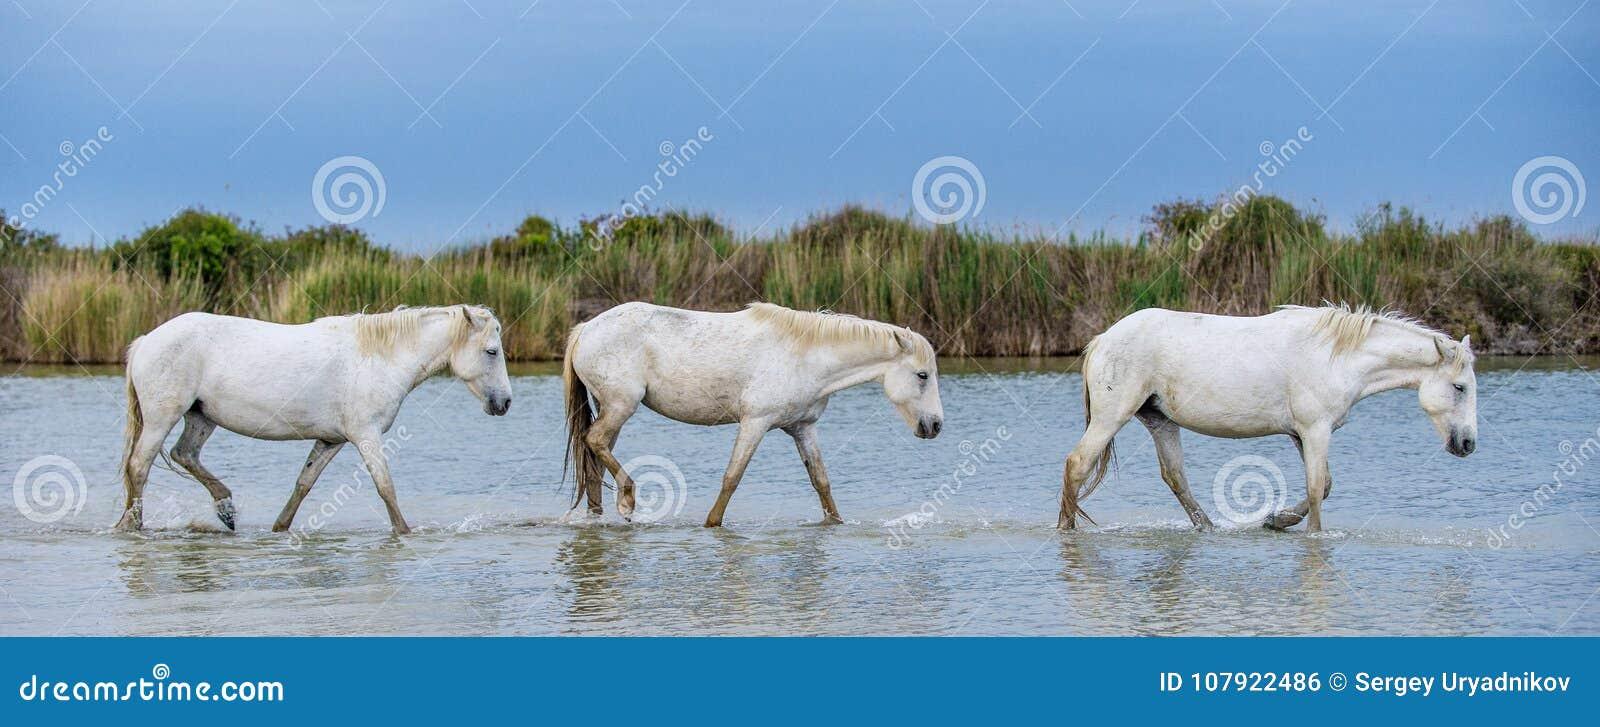 852 White Stallions Photos Free Royalty Free Stock Photos From Dreamstime